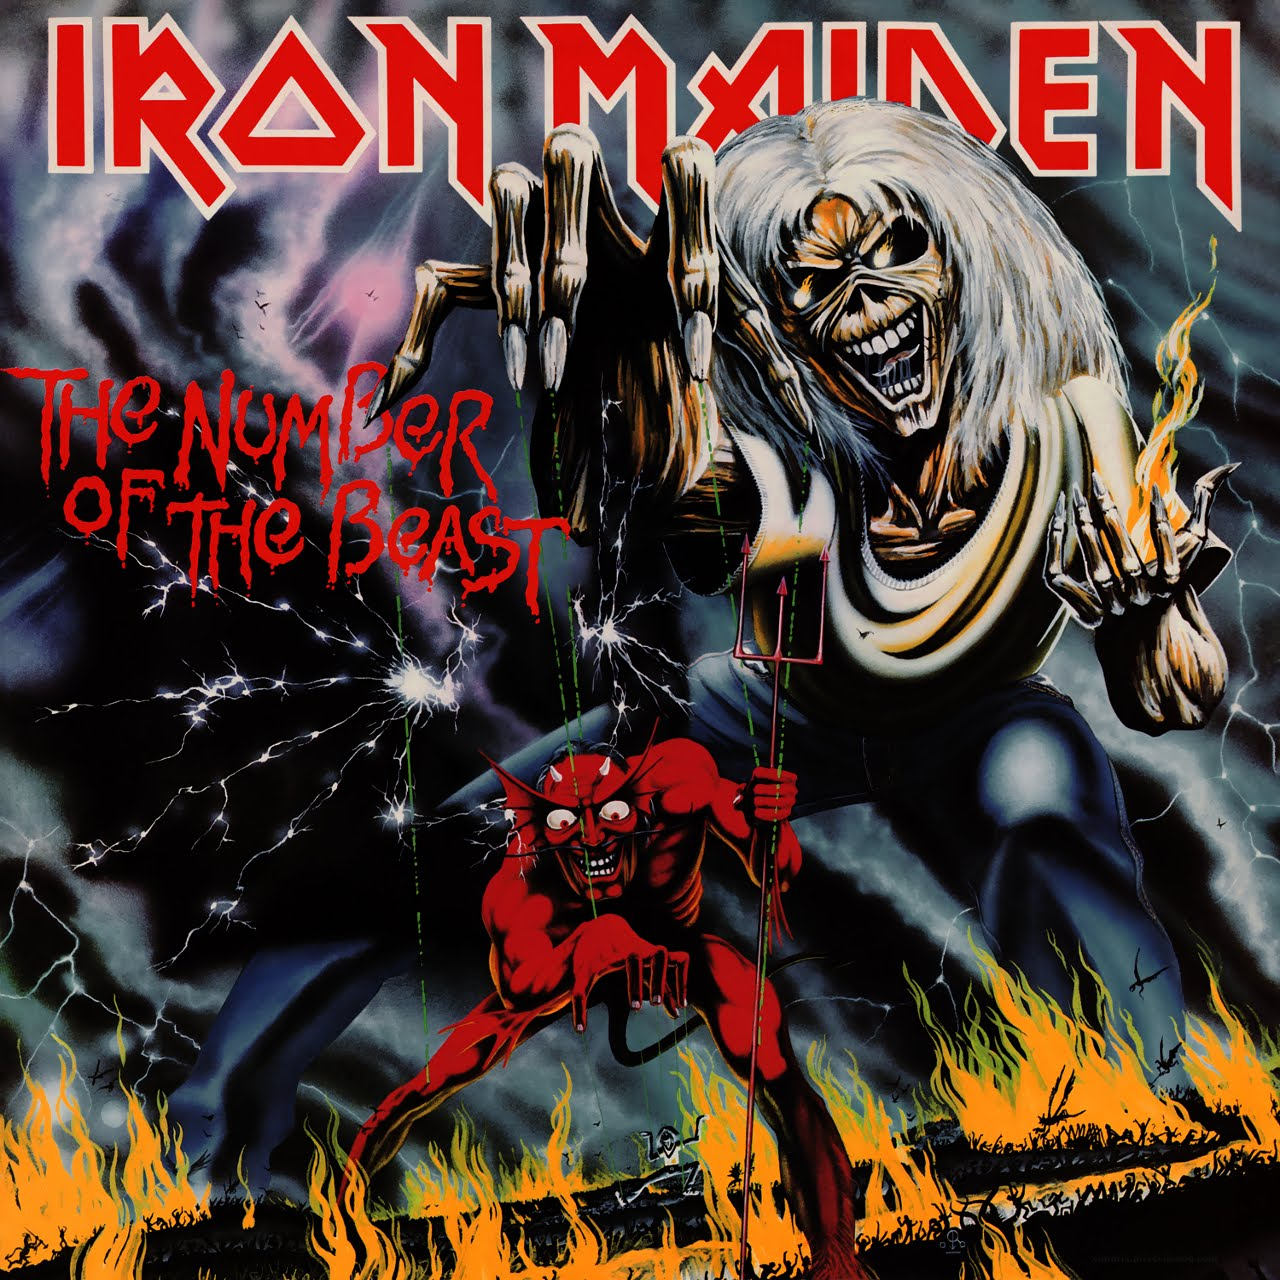 http://1.bp.blogspot.com/_rzdB5a4kLAo/TGXSGMCp9mI/AAAAAAAAVPw/uc5k4DCLmxs/s1600/album_iron_maiden_number_of_the_beast_remaster_ironmaidenwallpaper.com.jpg